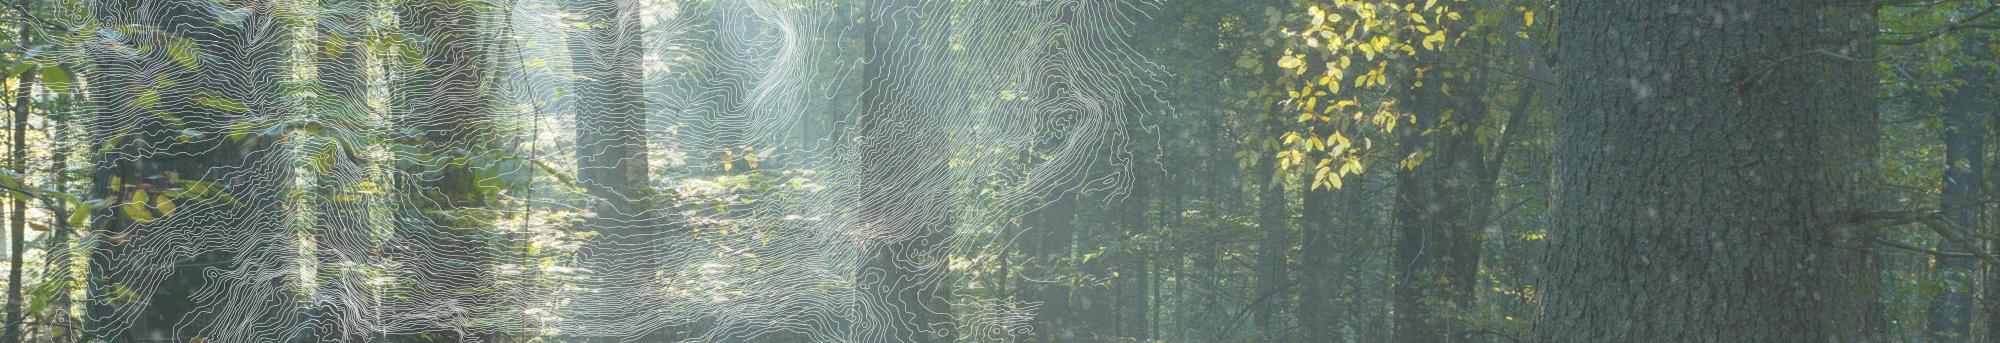 skog-bg-kurvor-informationslider